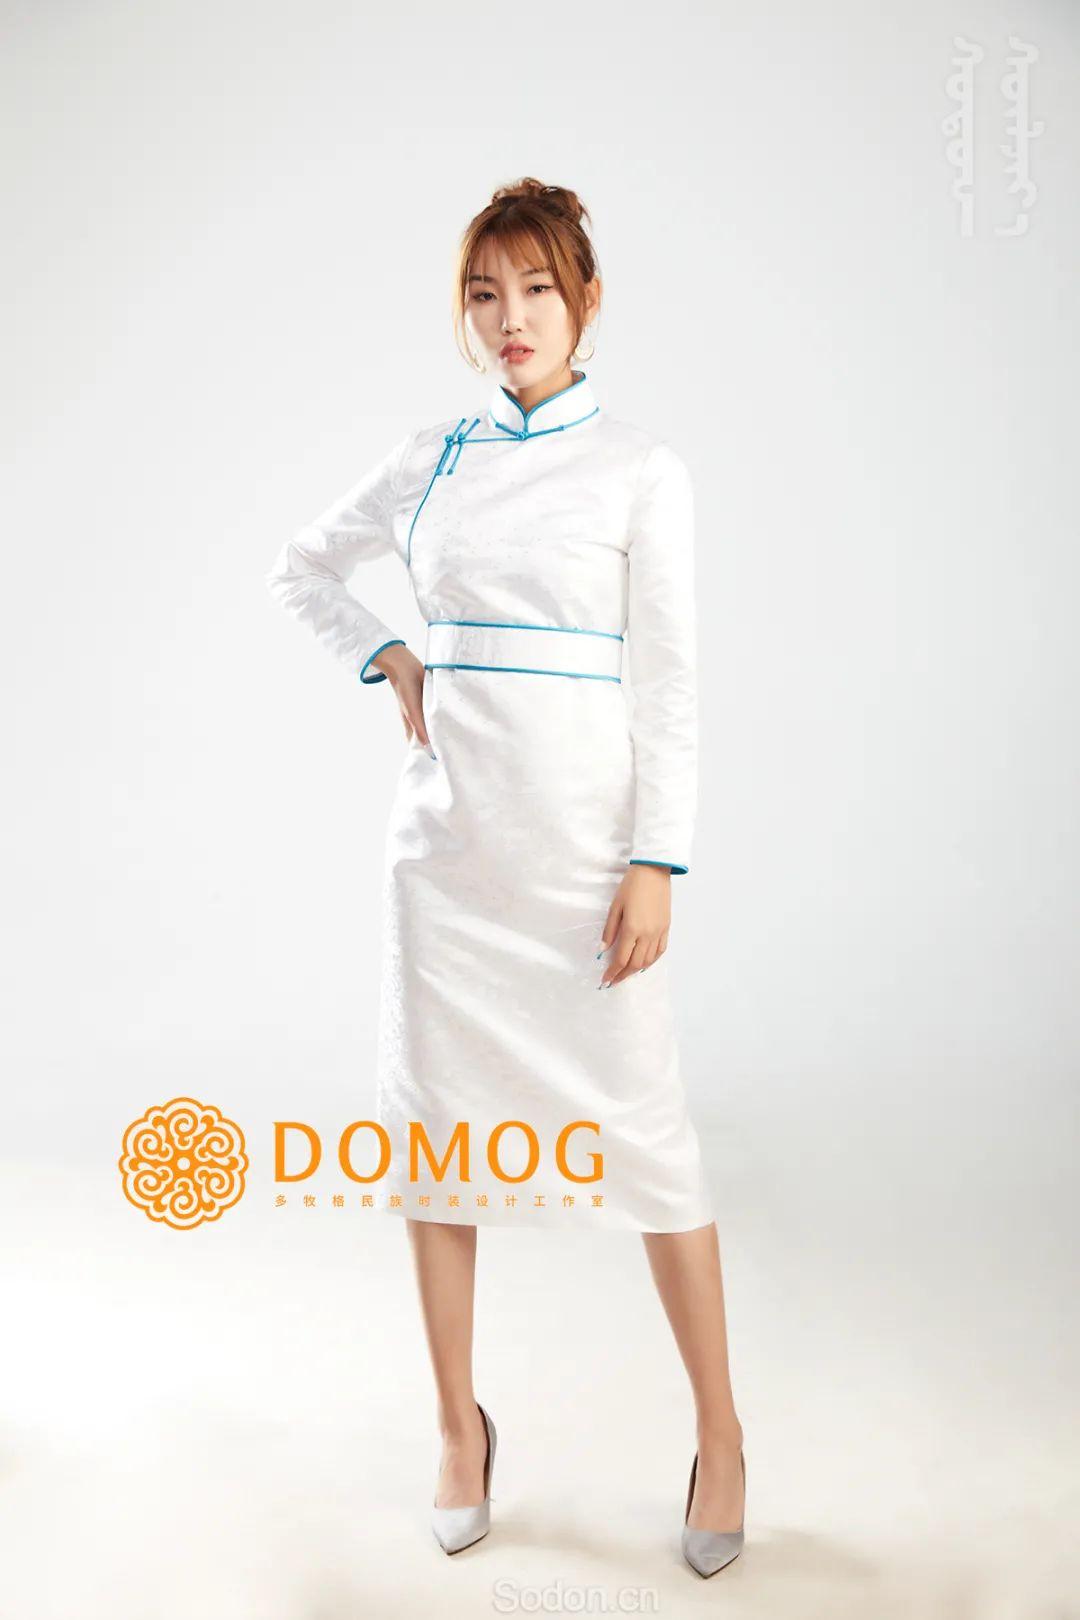 DOMOG 蒙古时装2020新款,民族与时尚的融合 第22张 DOMOG 蒙古时装2020新款,民族与时尚的融合 蒙古服饰